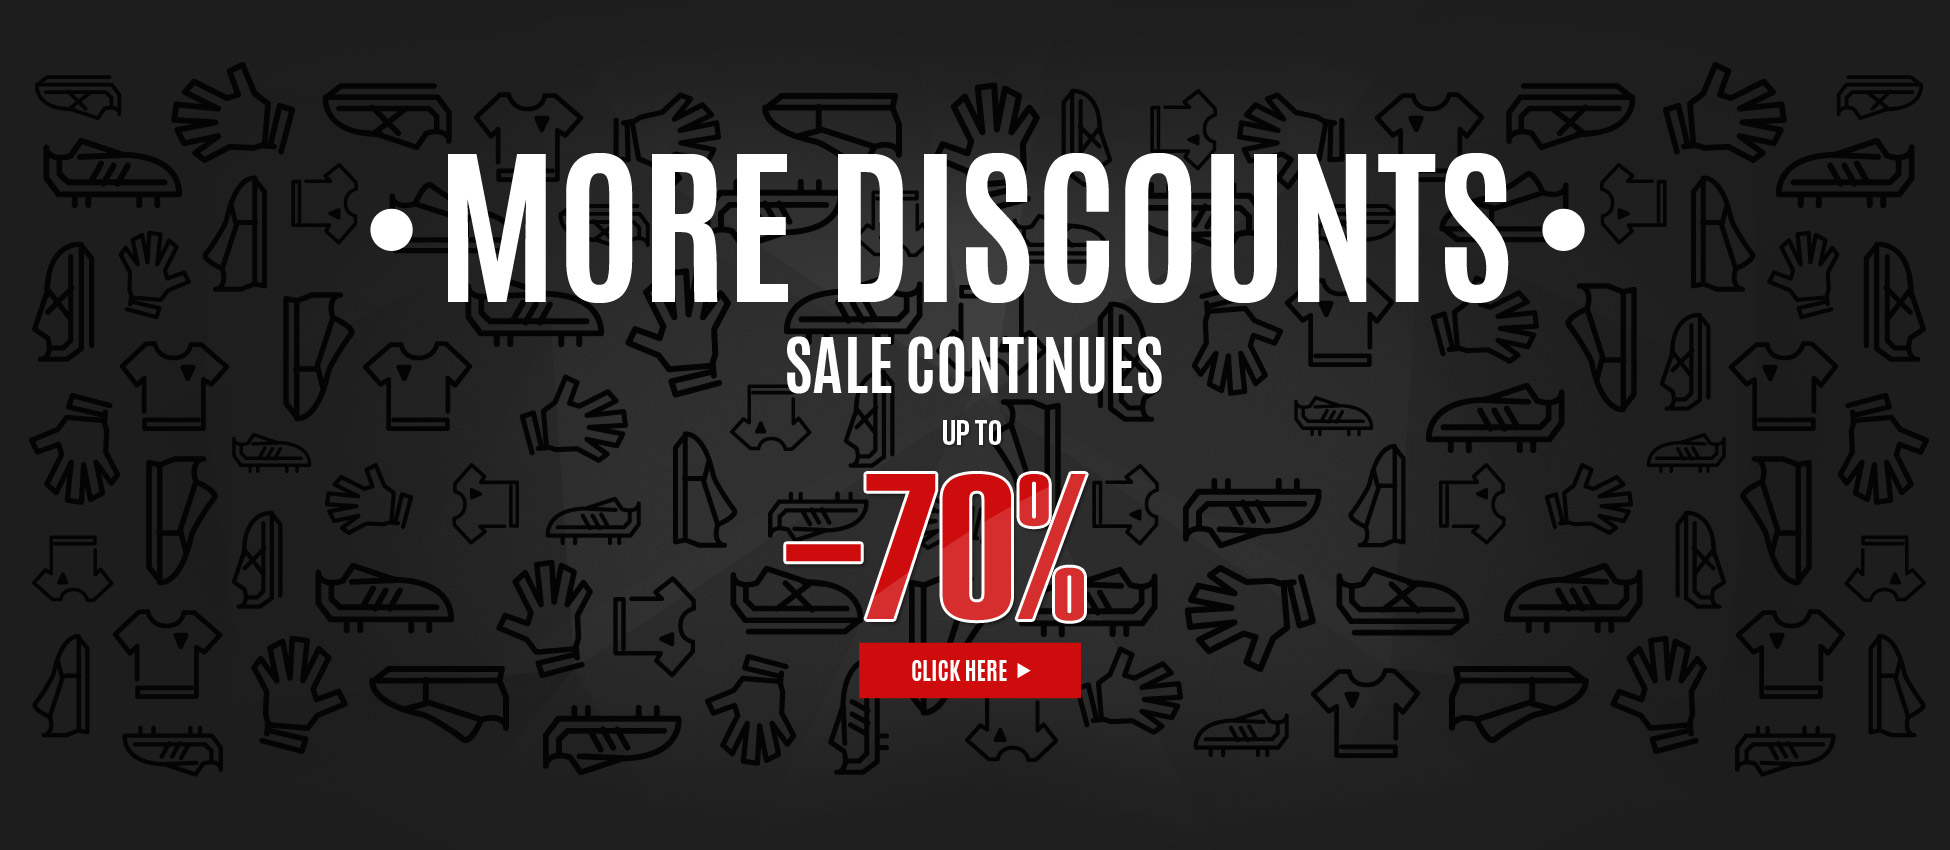 Discounts 70